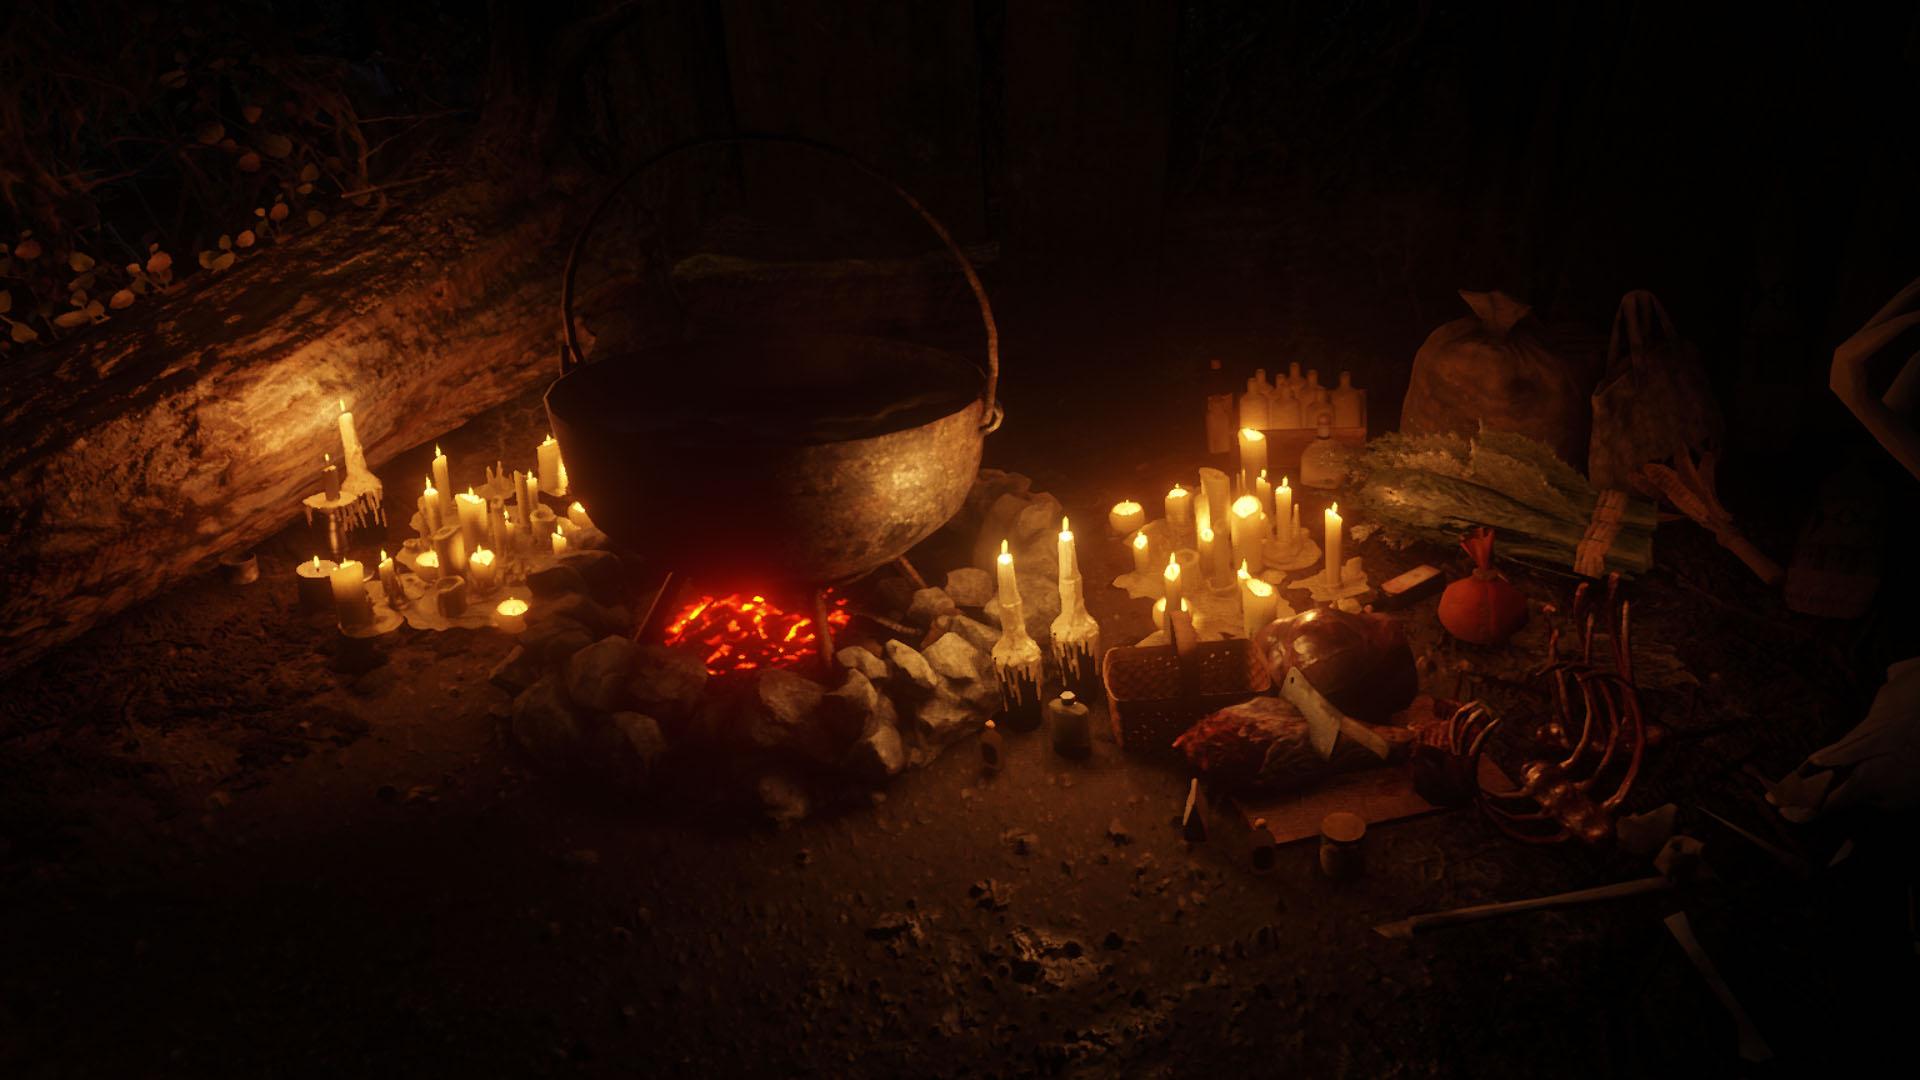 Witch's Caldron